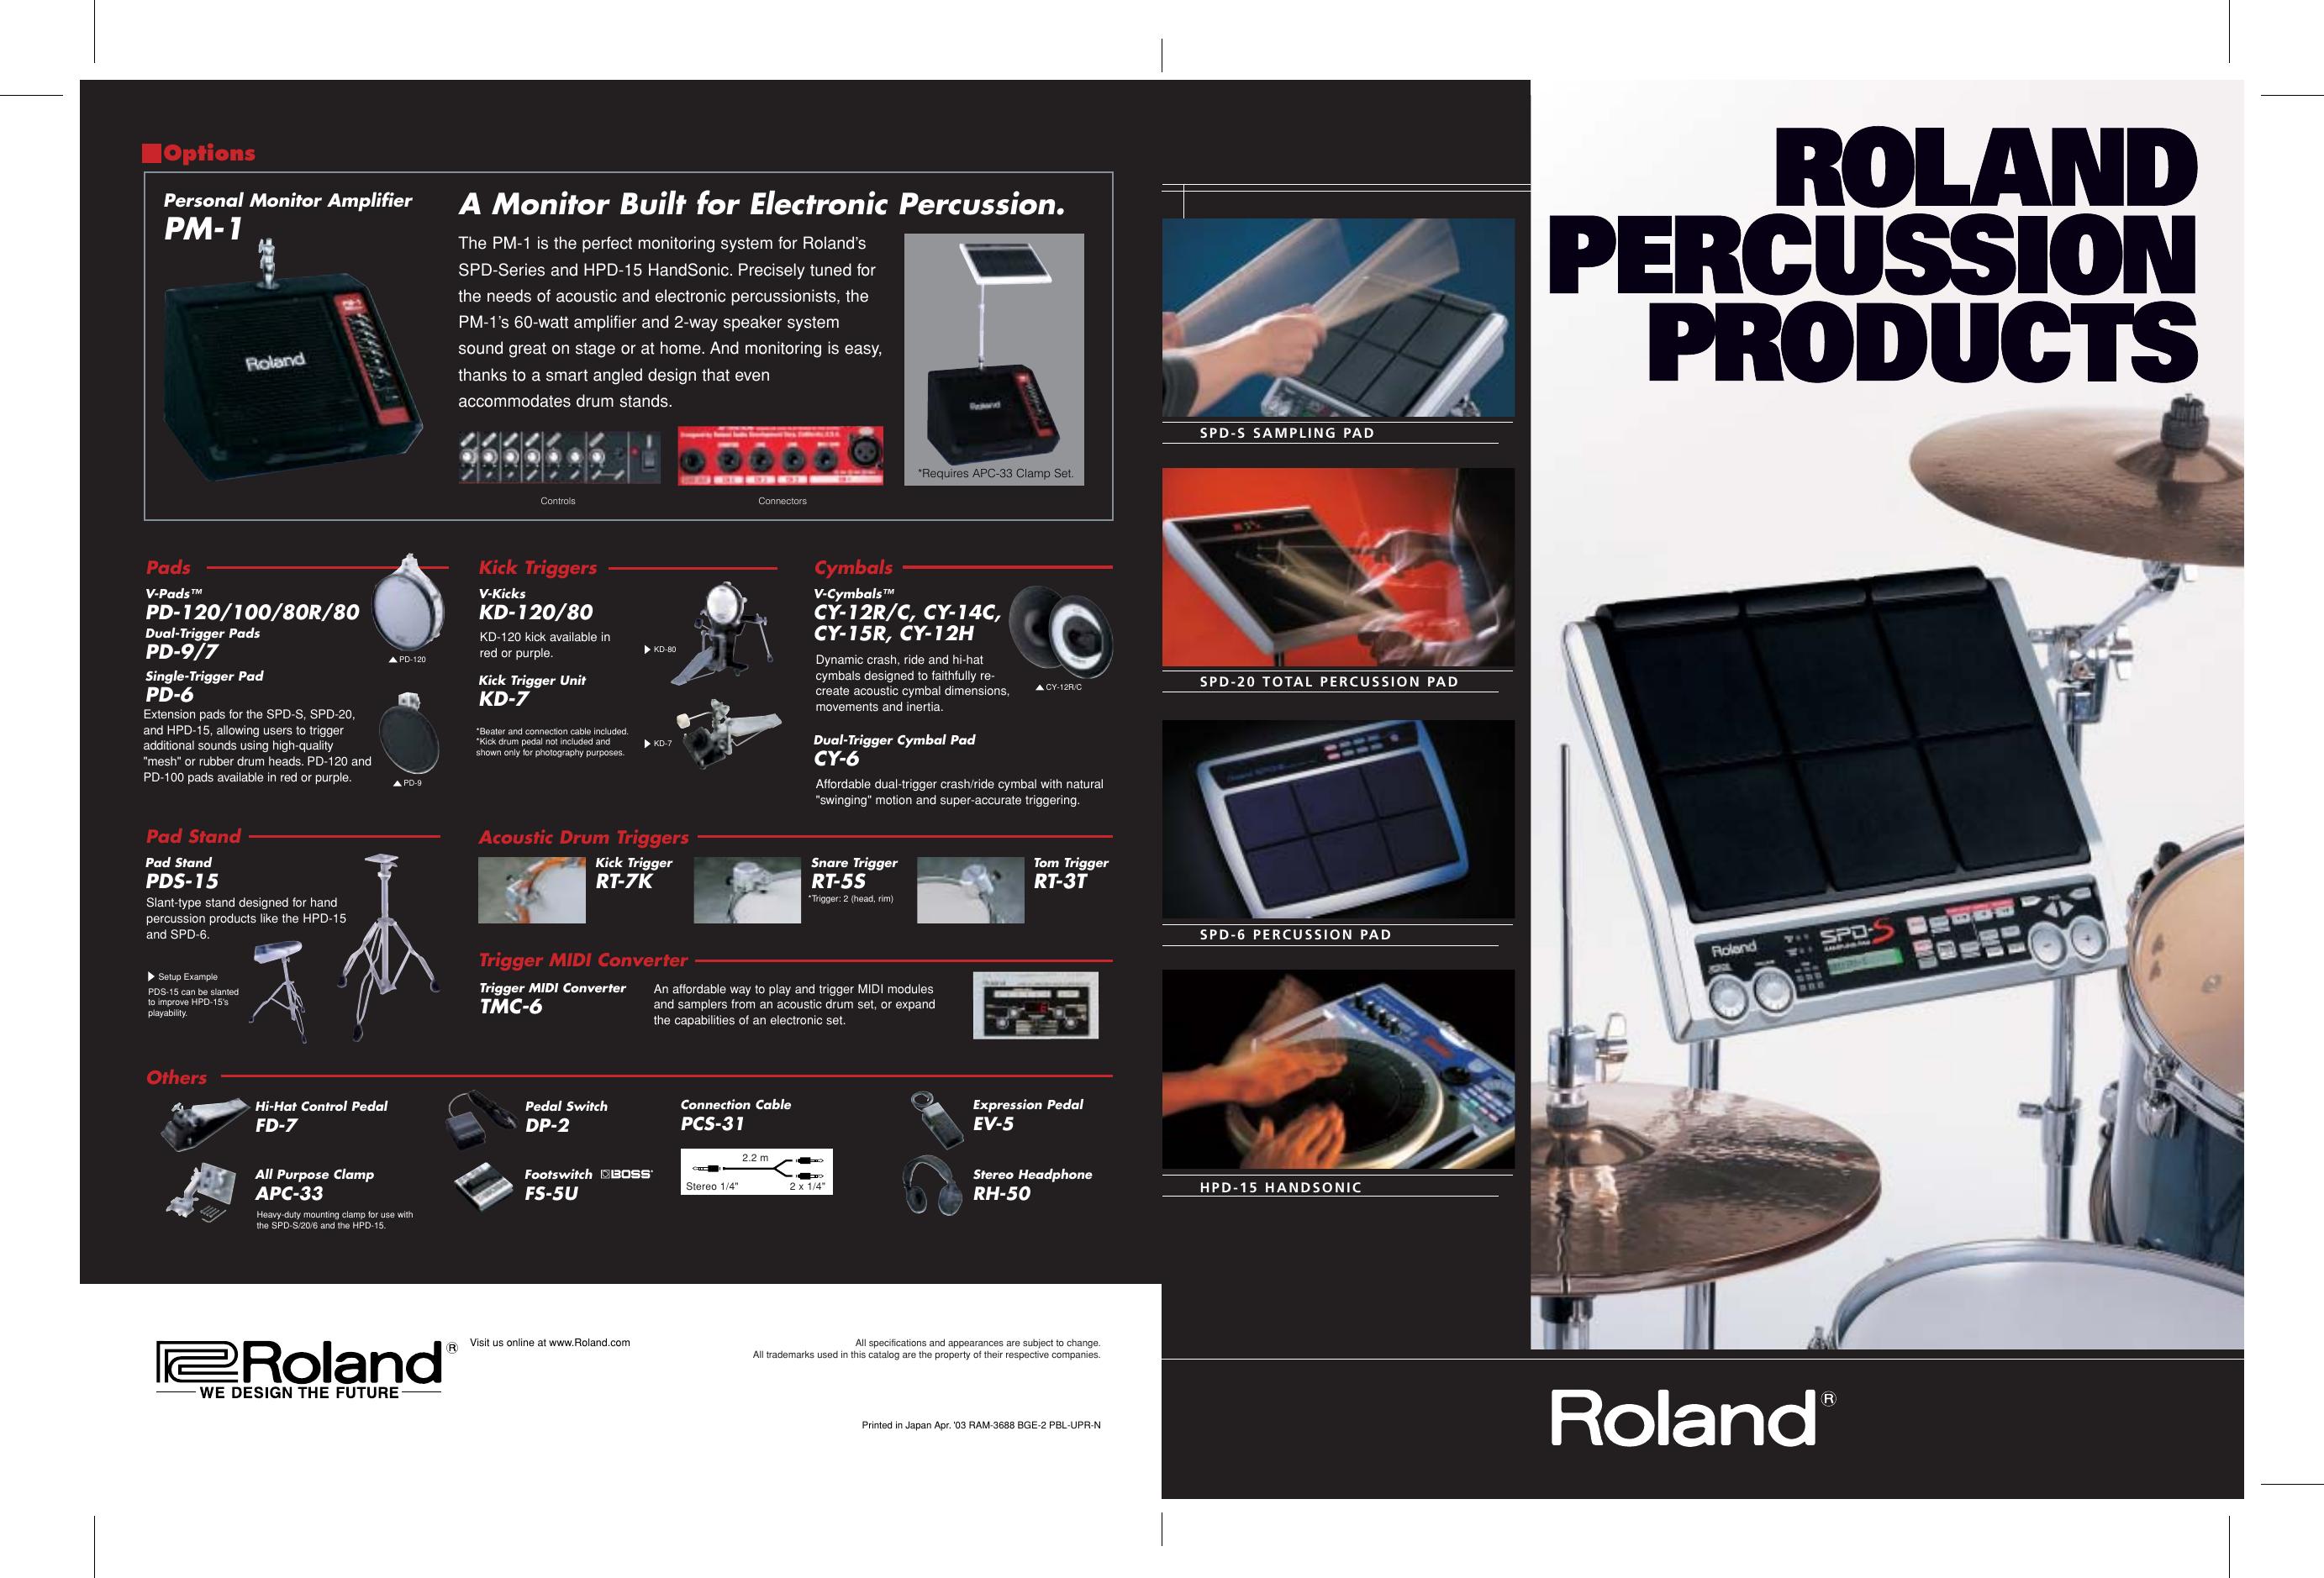 roland spd 6 users manual rh usermanual wiki Roland SPD- SX roland spd-6 manual en español